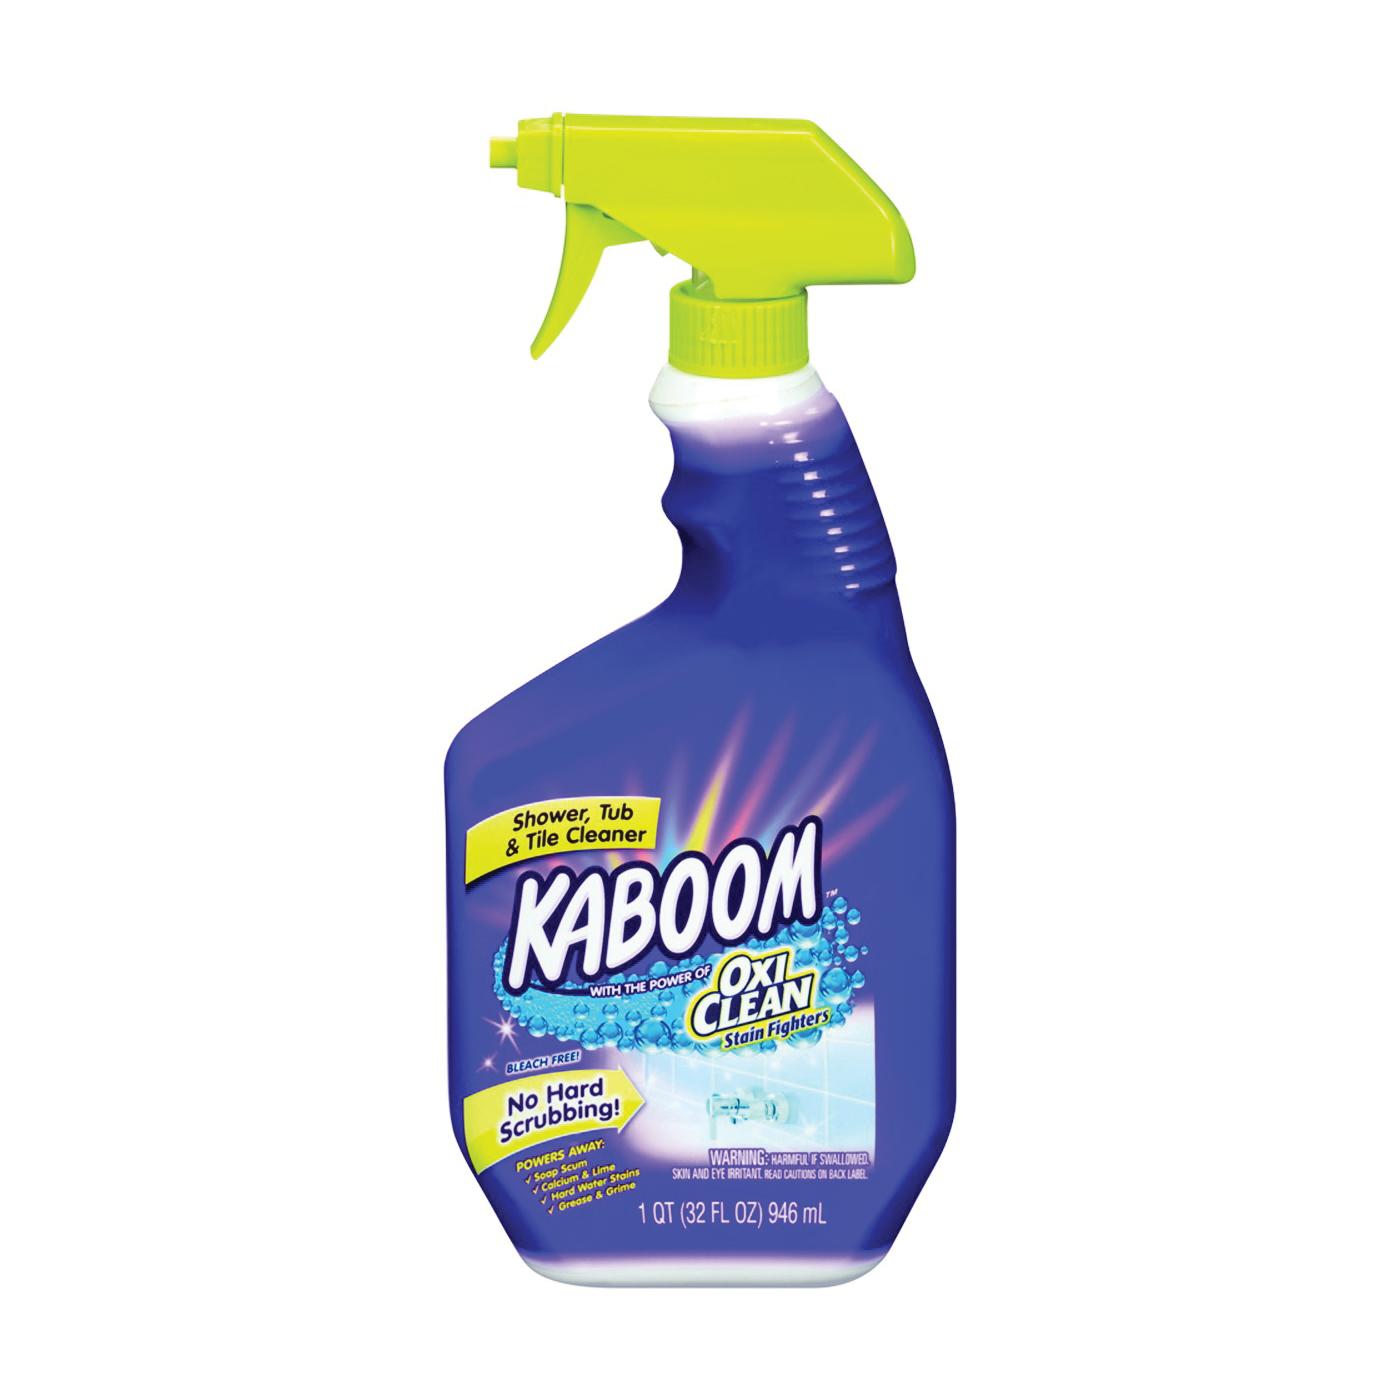 KABOOM 35015